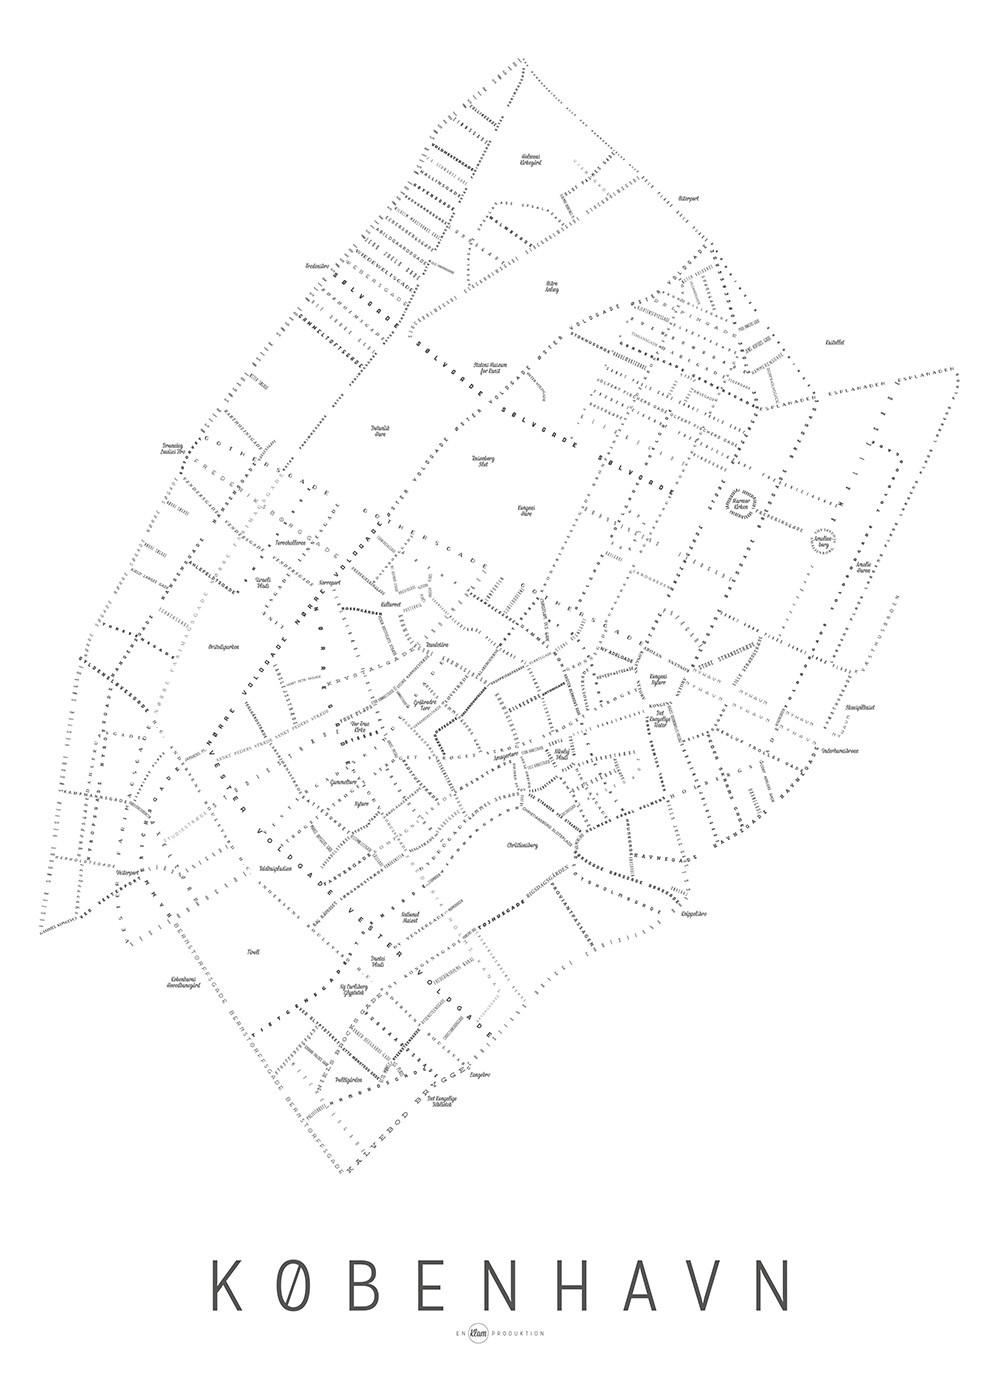 justspotted kobenhavn_typemap_white_df3dd3be-a9e8-4e20-8bc8-1e581680f42a.jpg